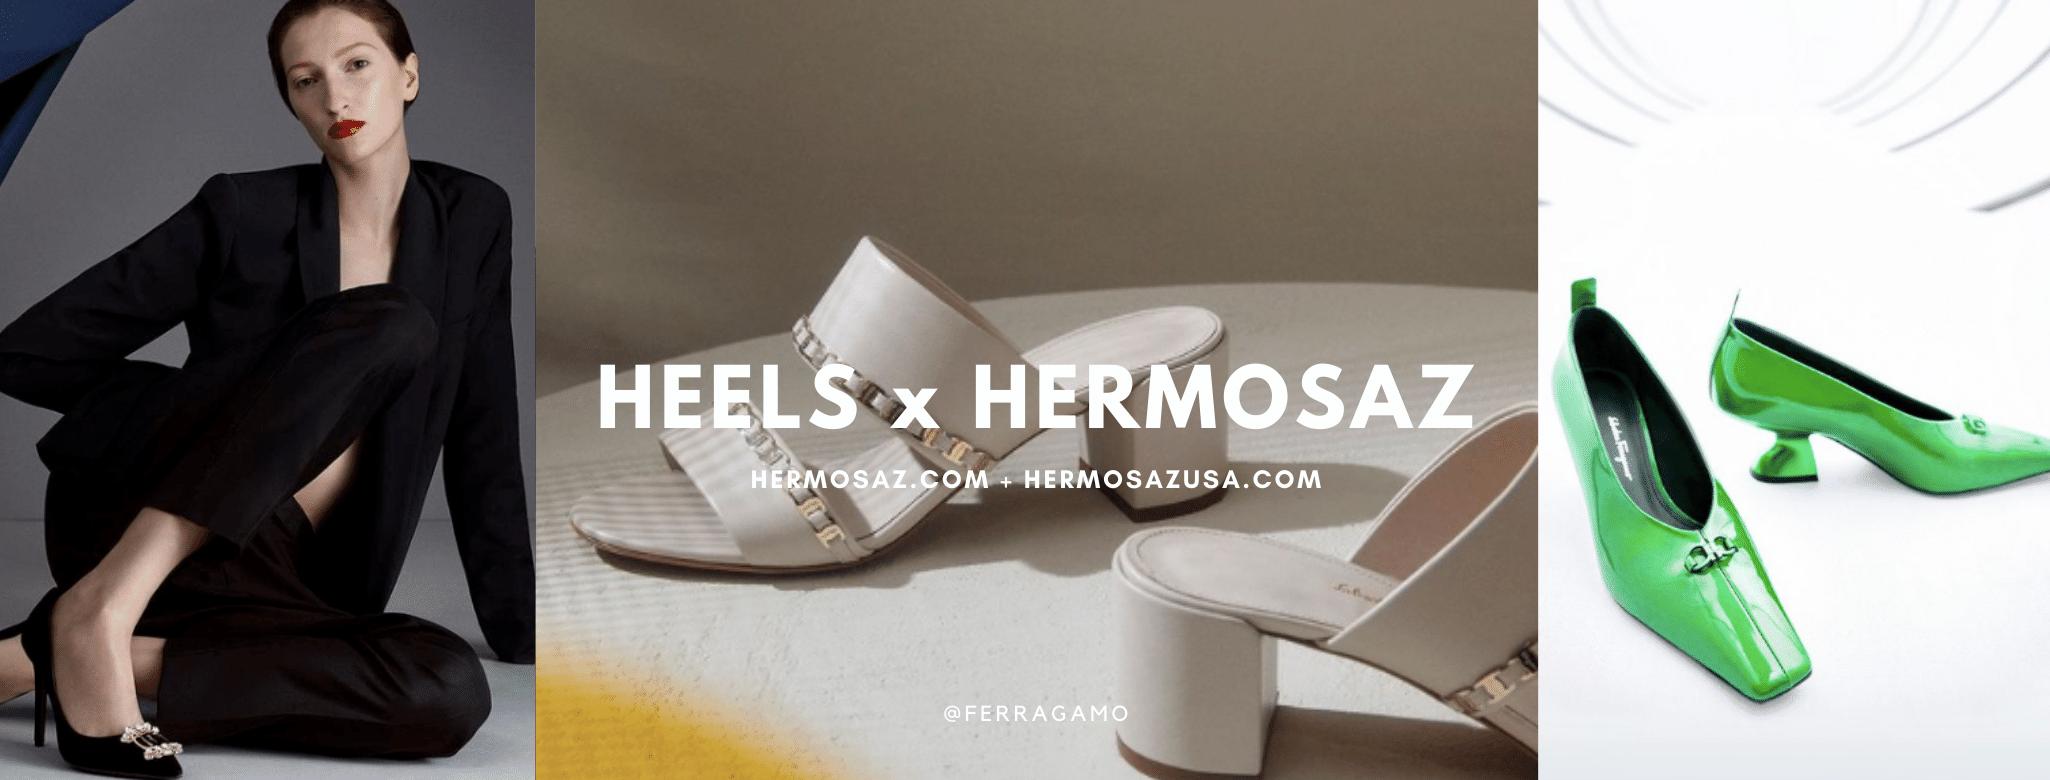 Heels x Hermosaz